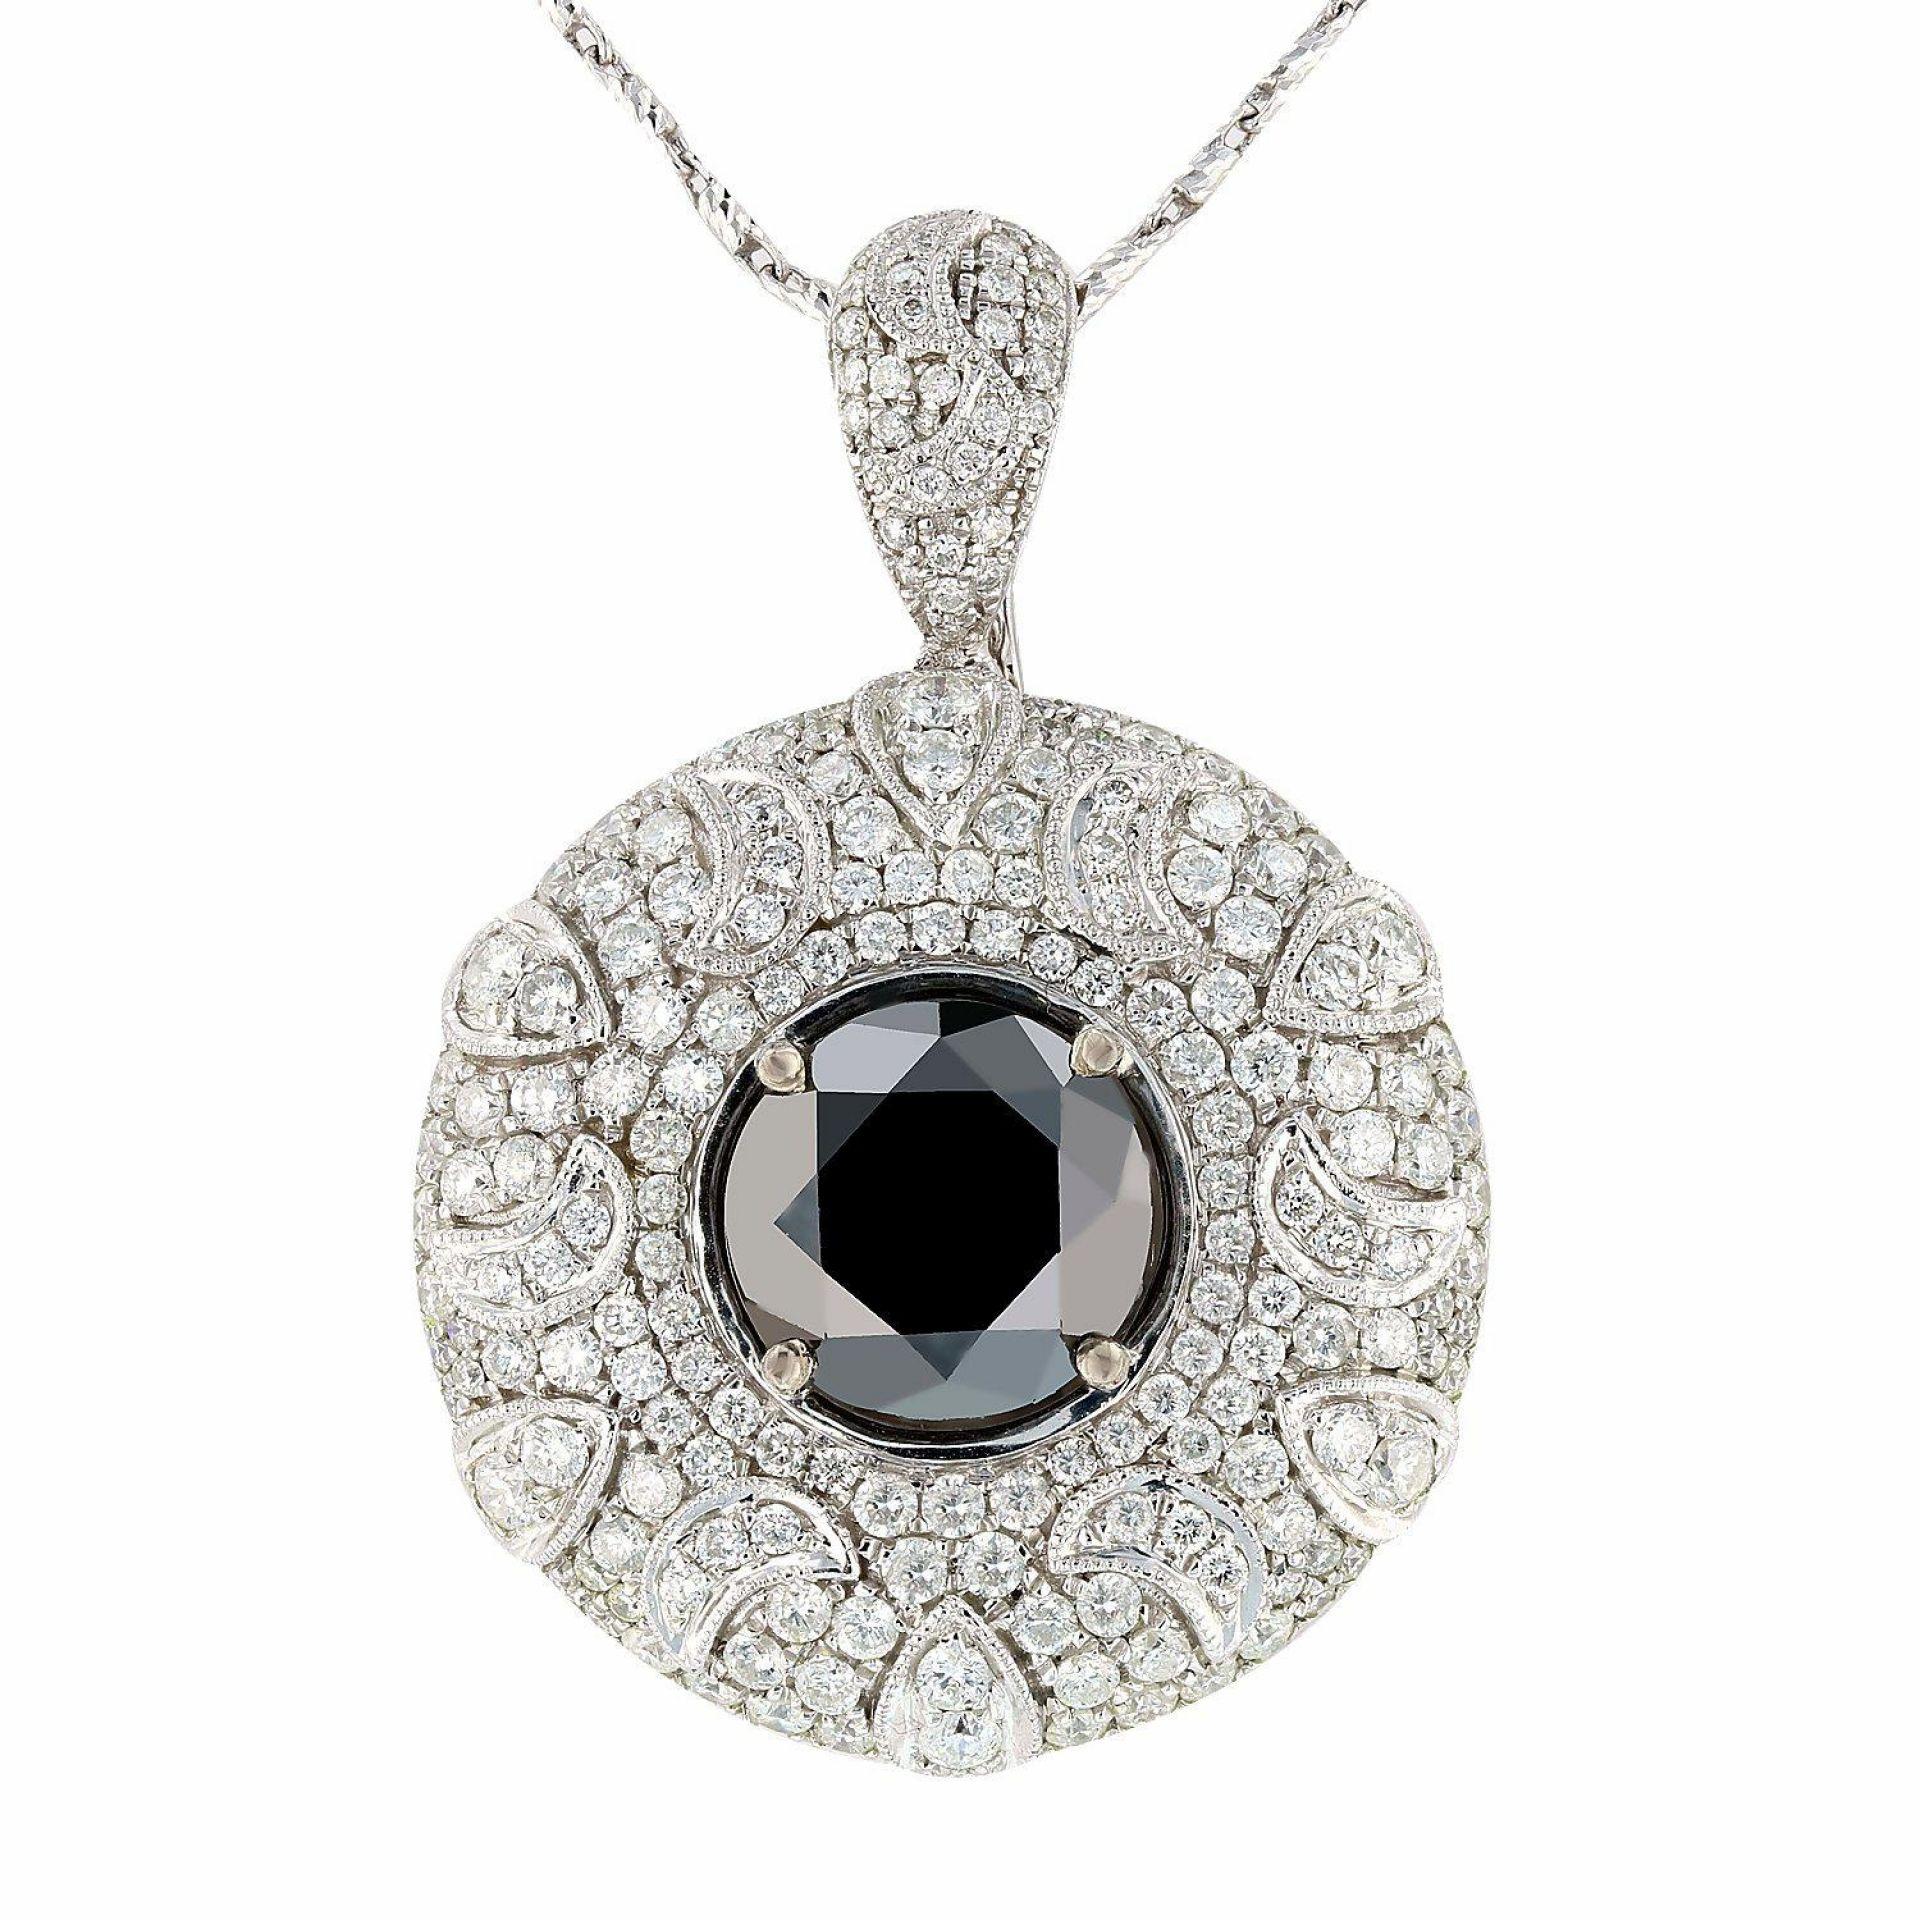 6.51ct Black and 3.41ctw White Diamond 14K White Gold Pendant/Necklace (EGL CERT